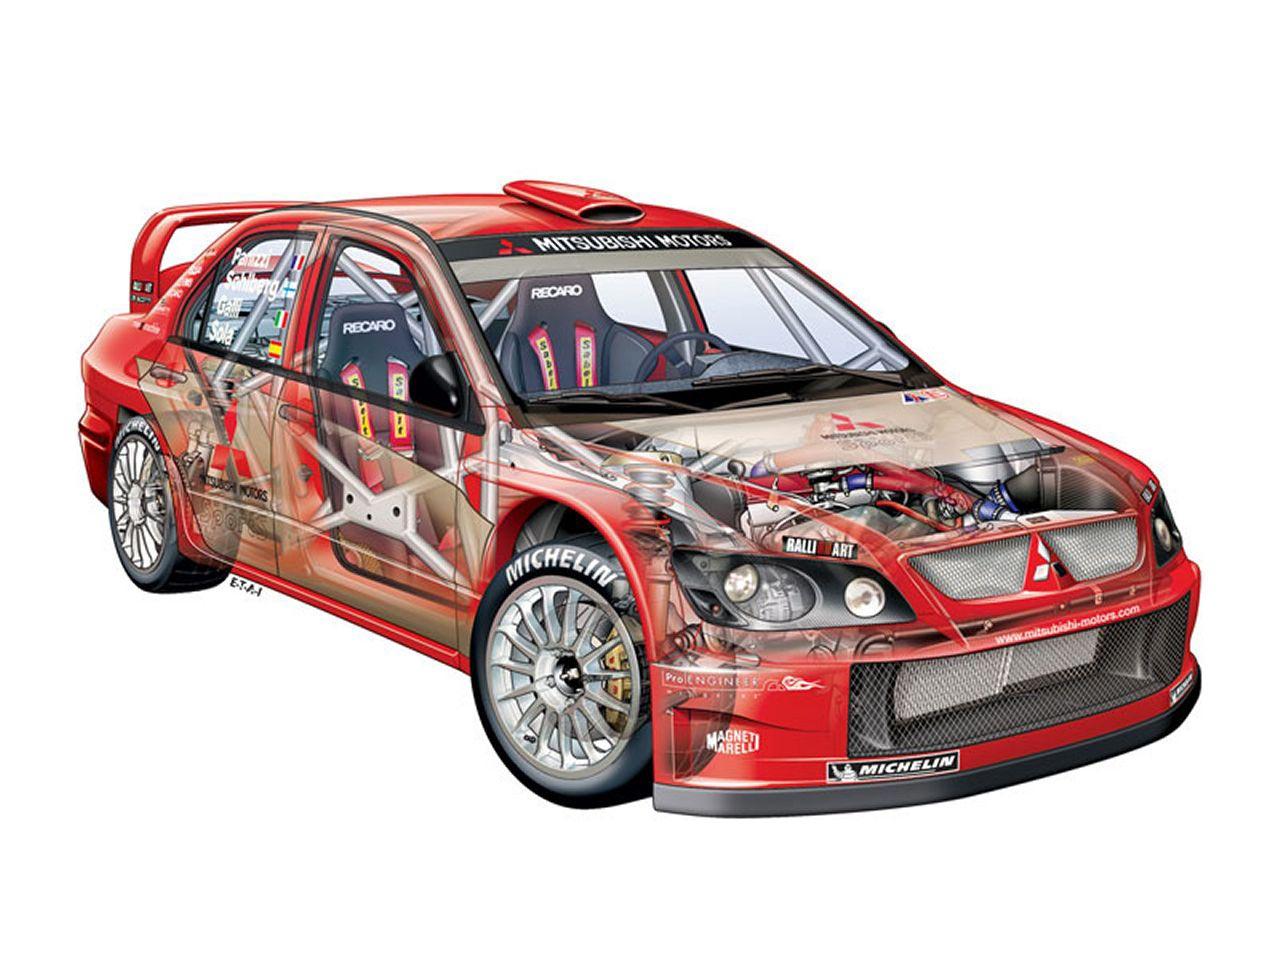 Mitsubishi Lancer WRC cutaway